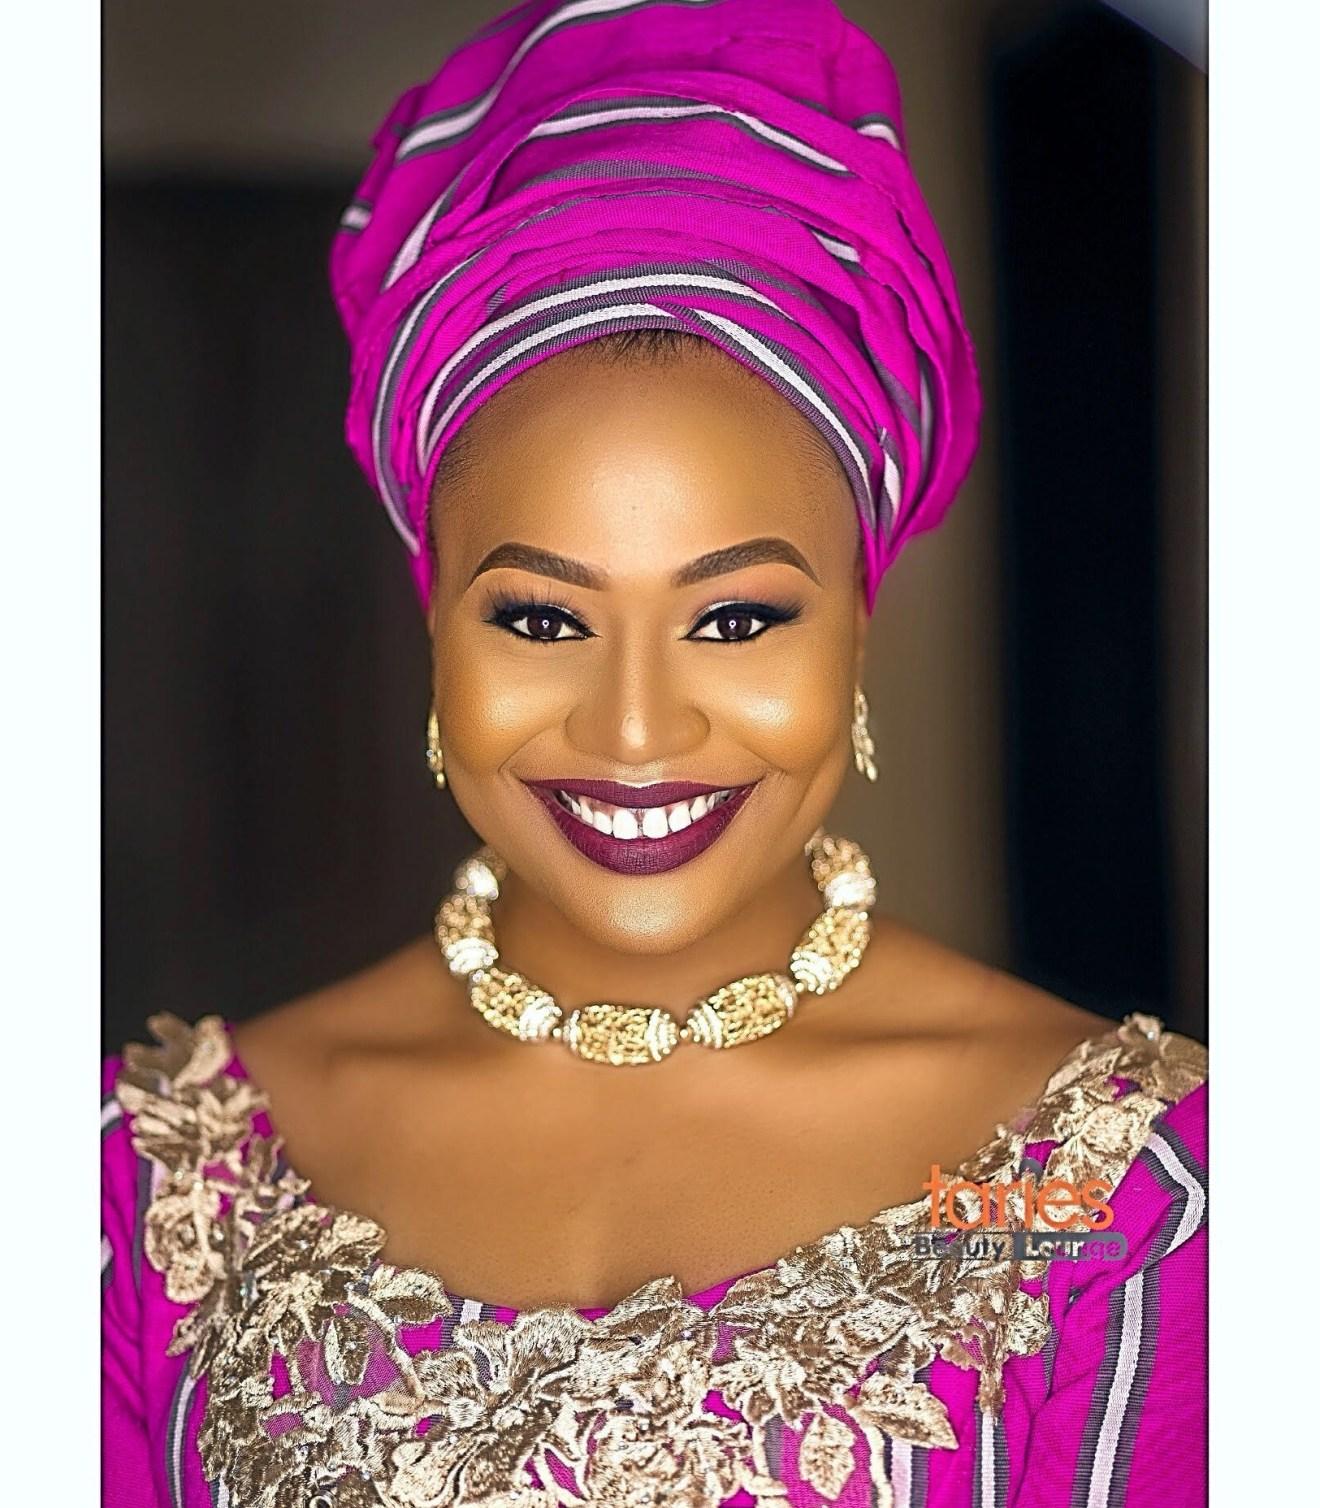 Ex Bbnaija Housemate Vandora in new photos, Hausa bridal inspiration with Aso Oke